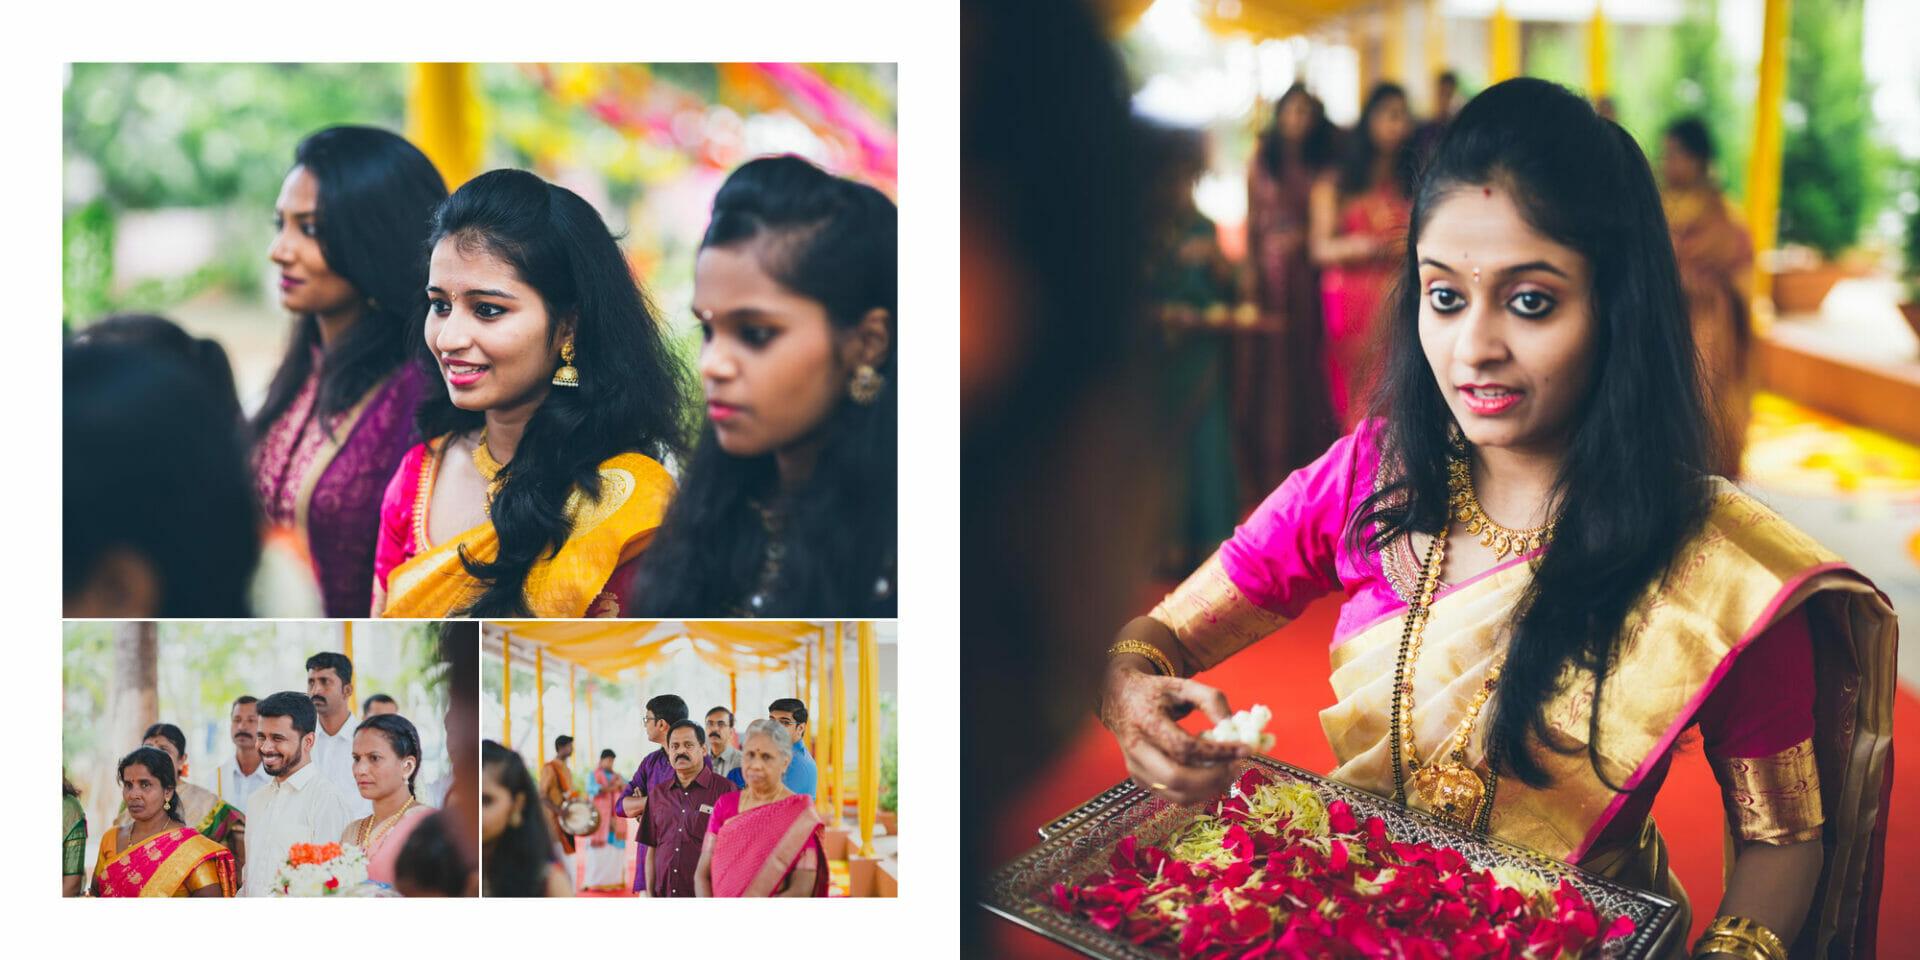 shruti annayya sree vikash photography wedding kalathur gardens 11